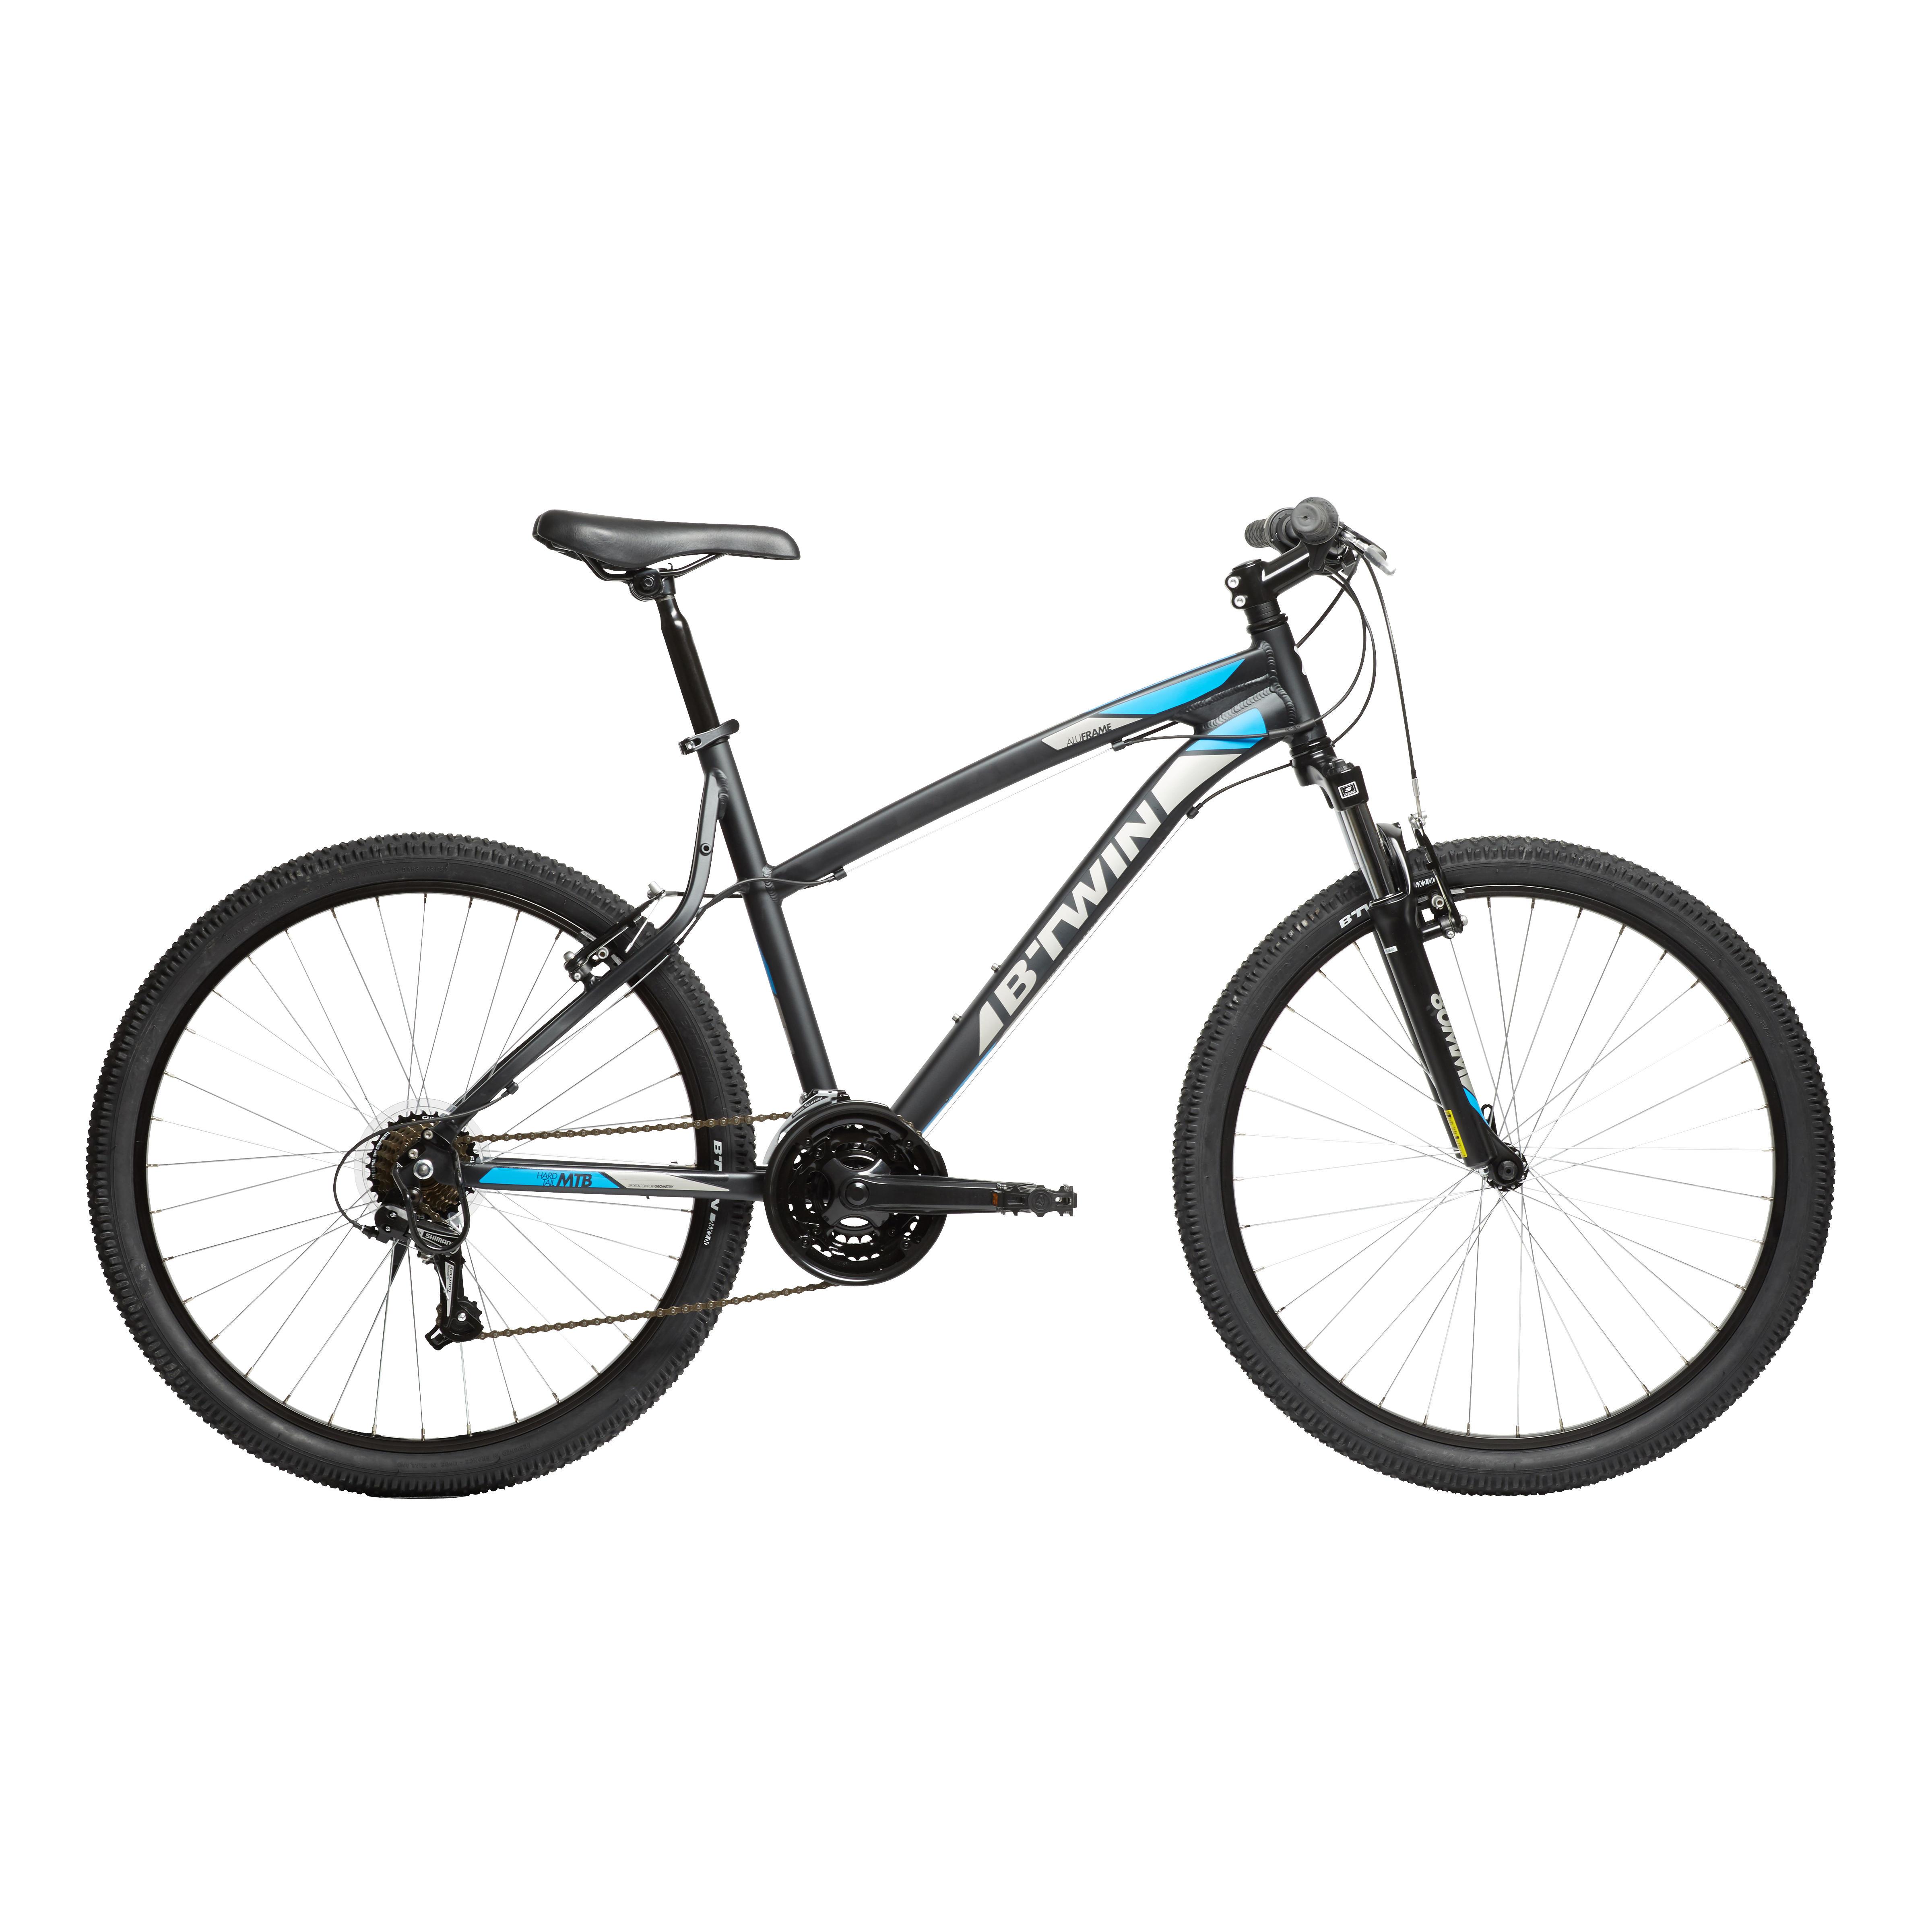 new lower prices great look usa cheap sale Vélos VTT randonnée hommes | Decathlon